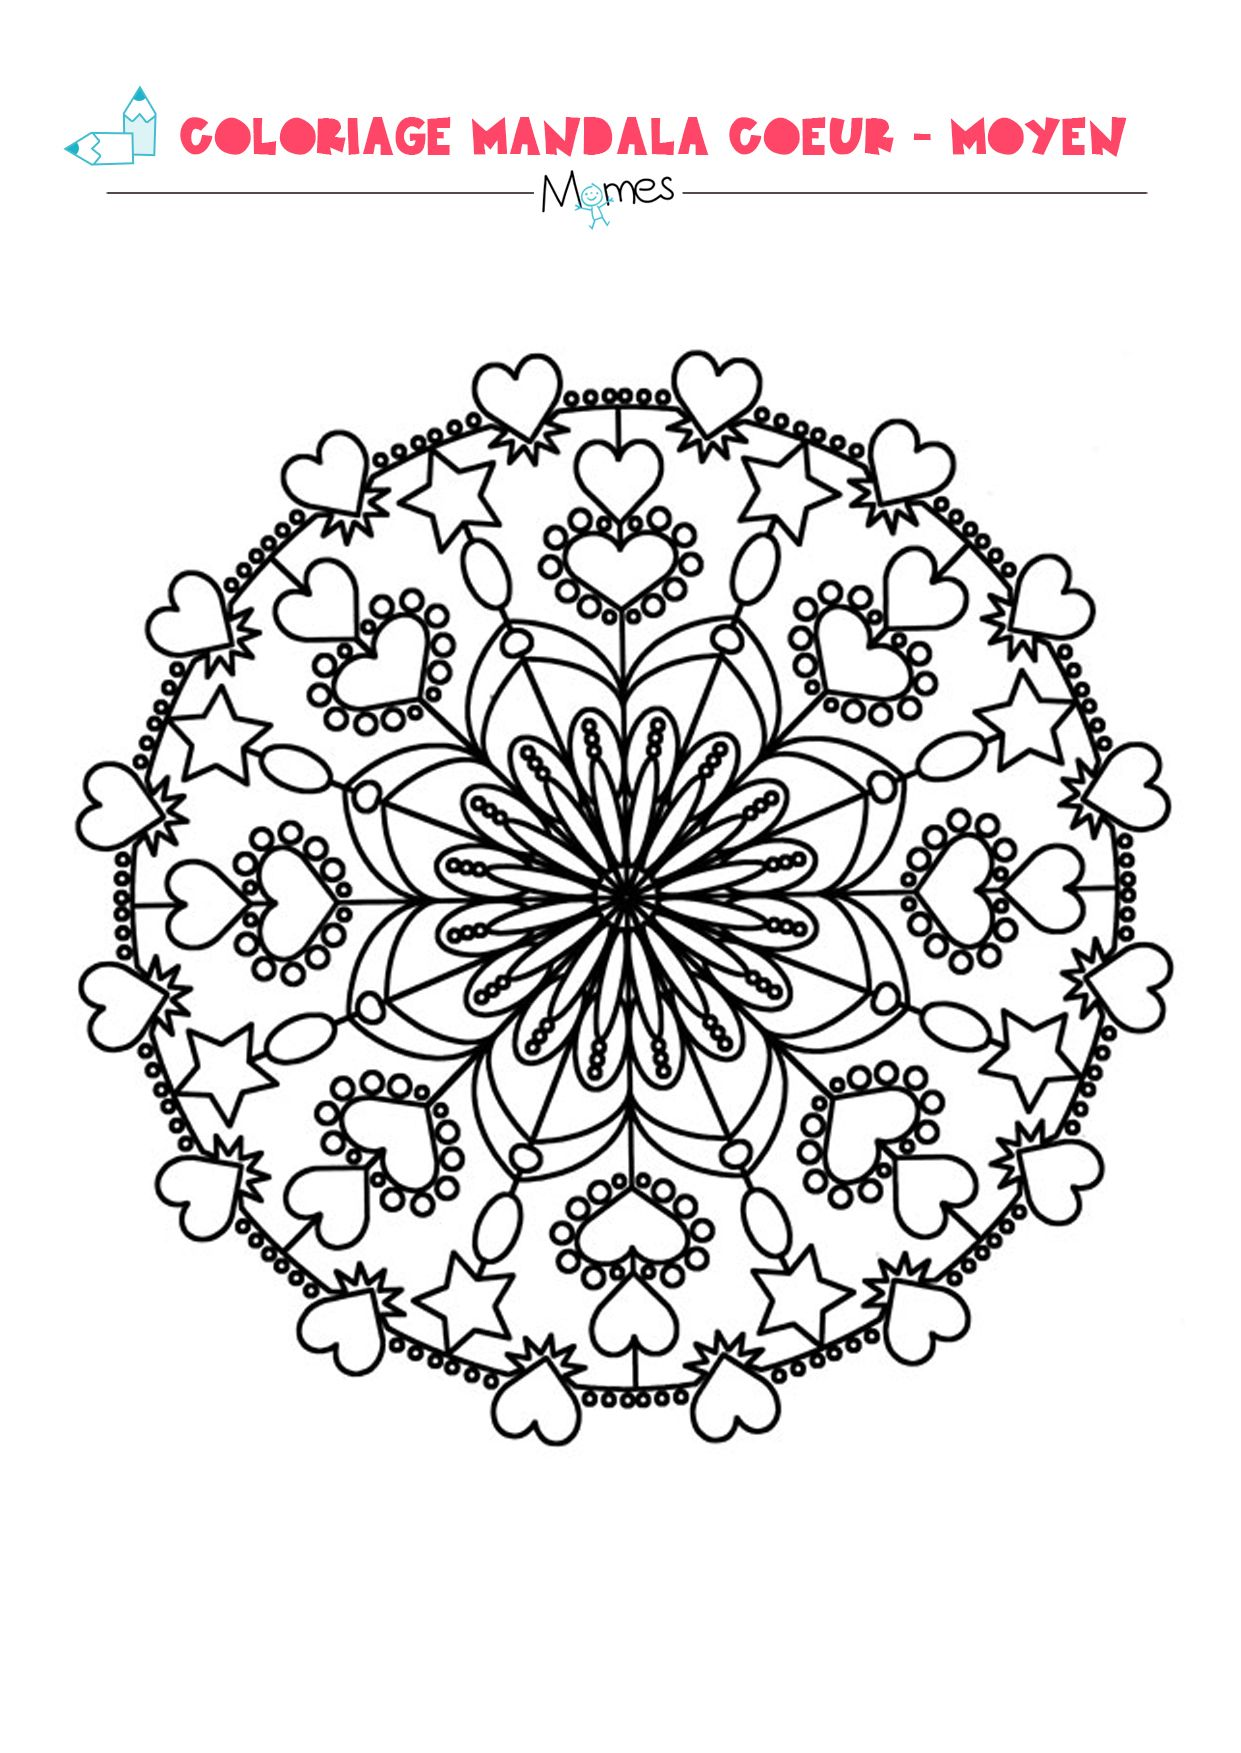 Mandala Coeur à Colorier Moyen Cizimler Coeur à